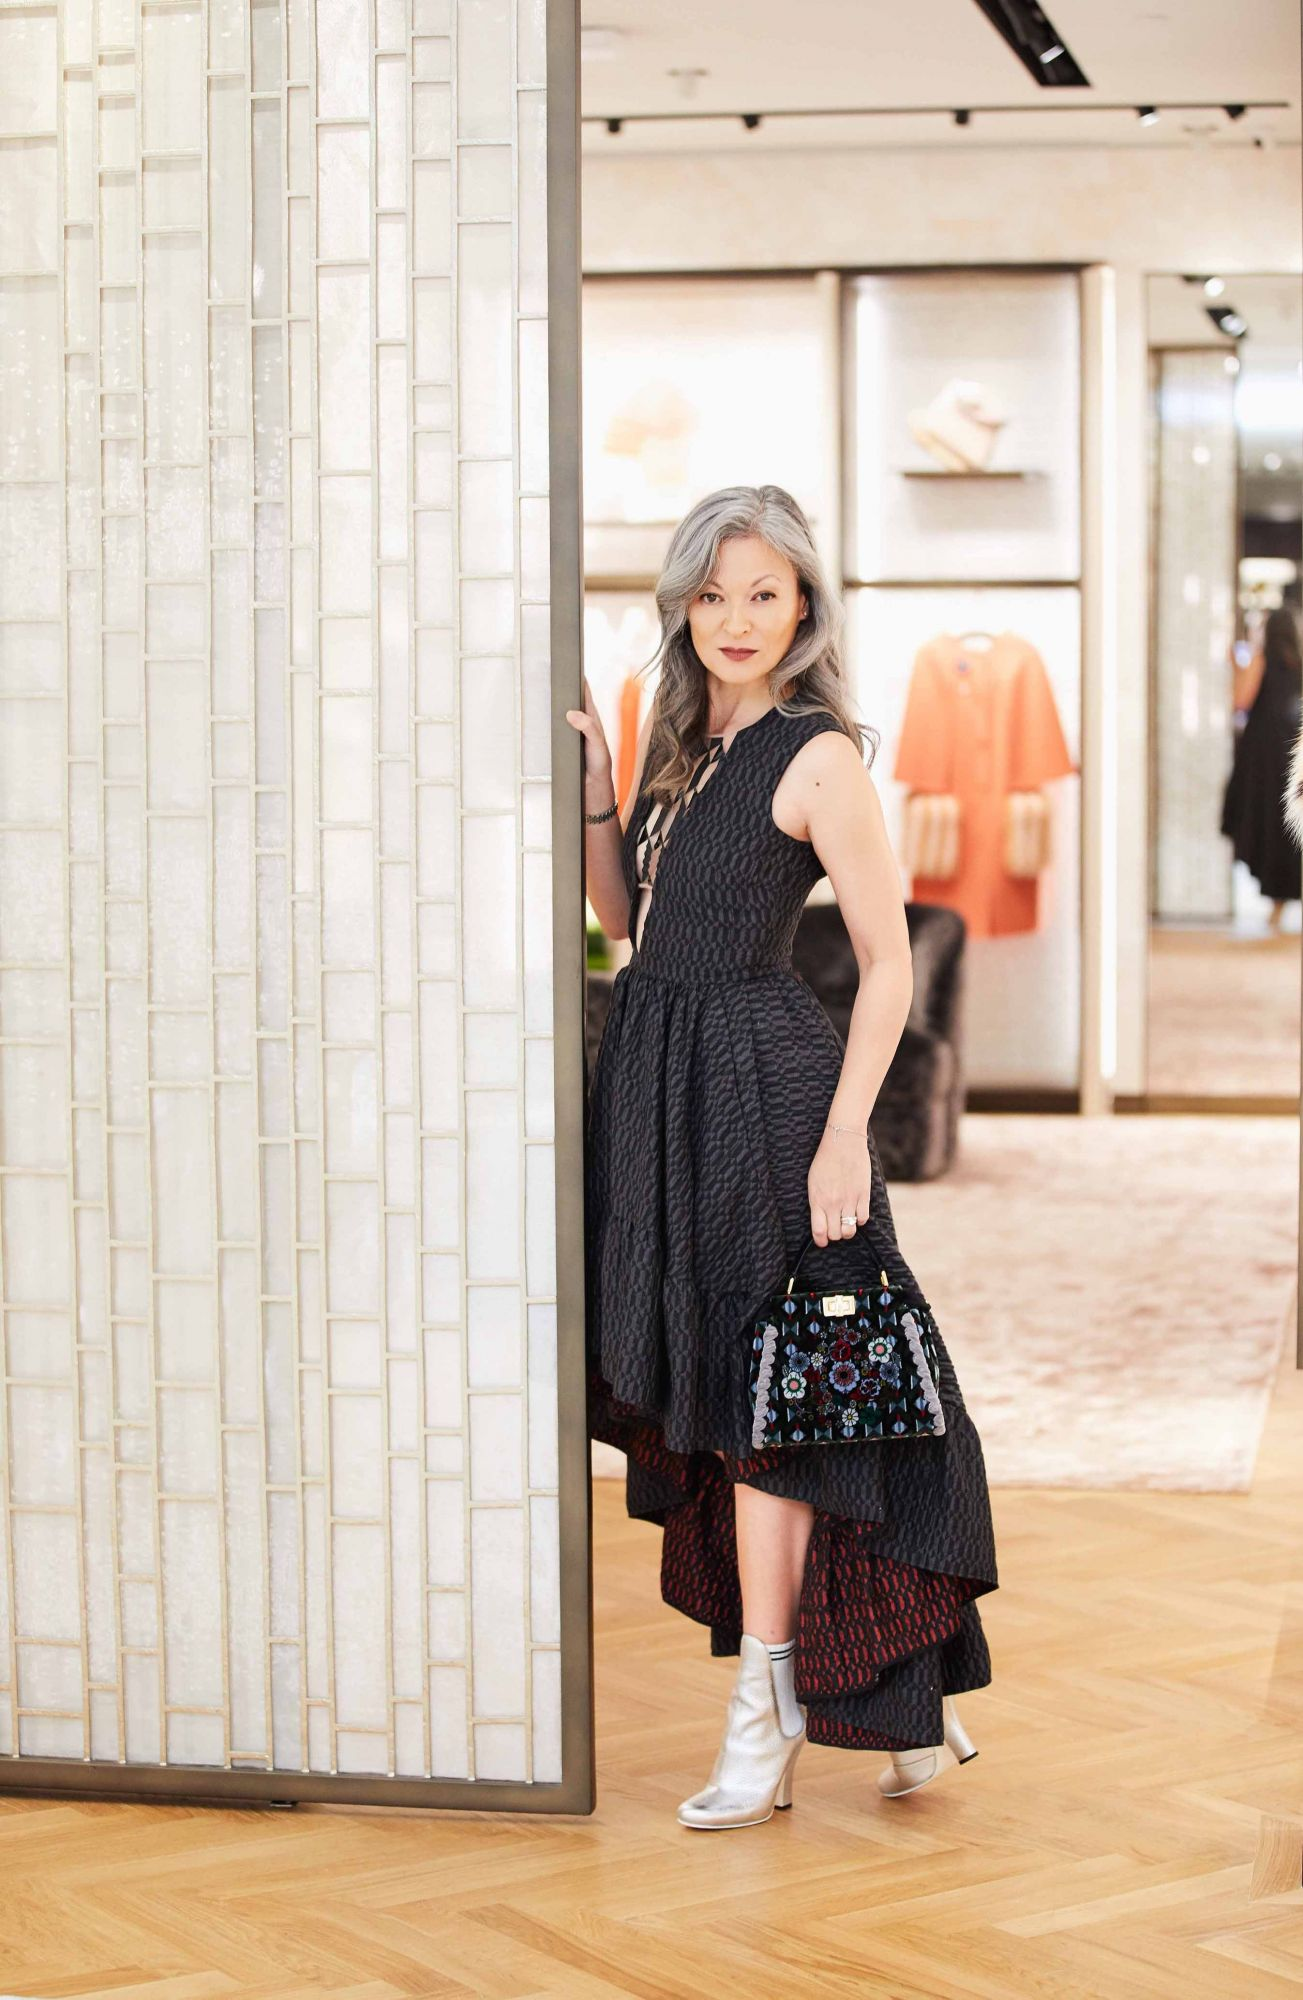 7530cbec13 Margie Van Elten Visits Fendi s Newest Flagship Store